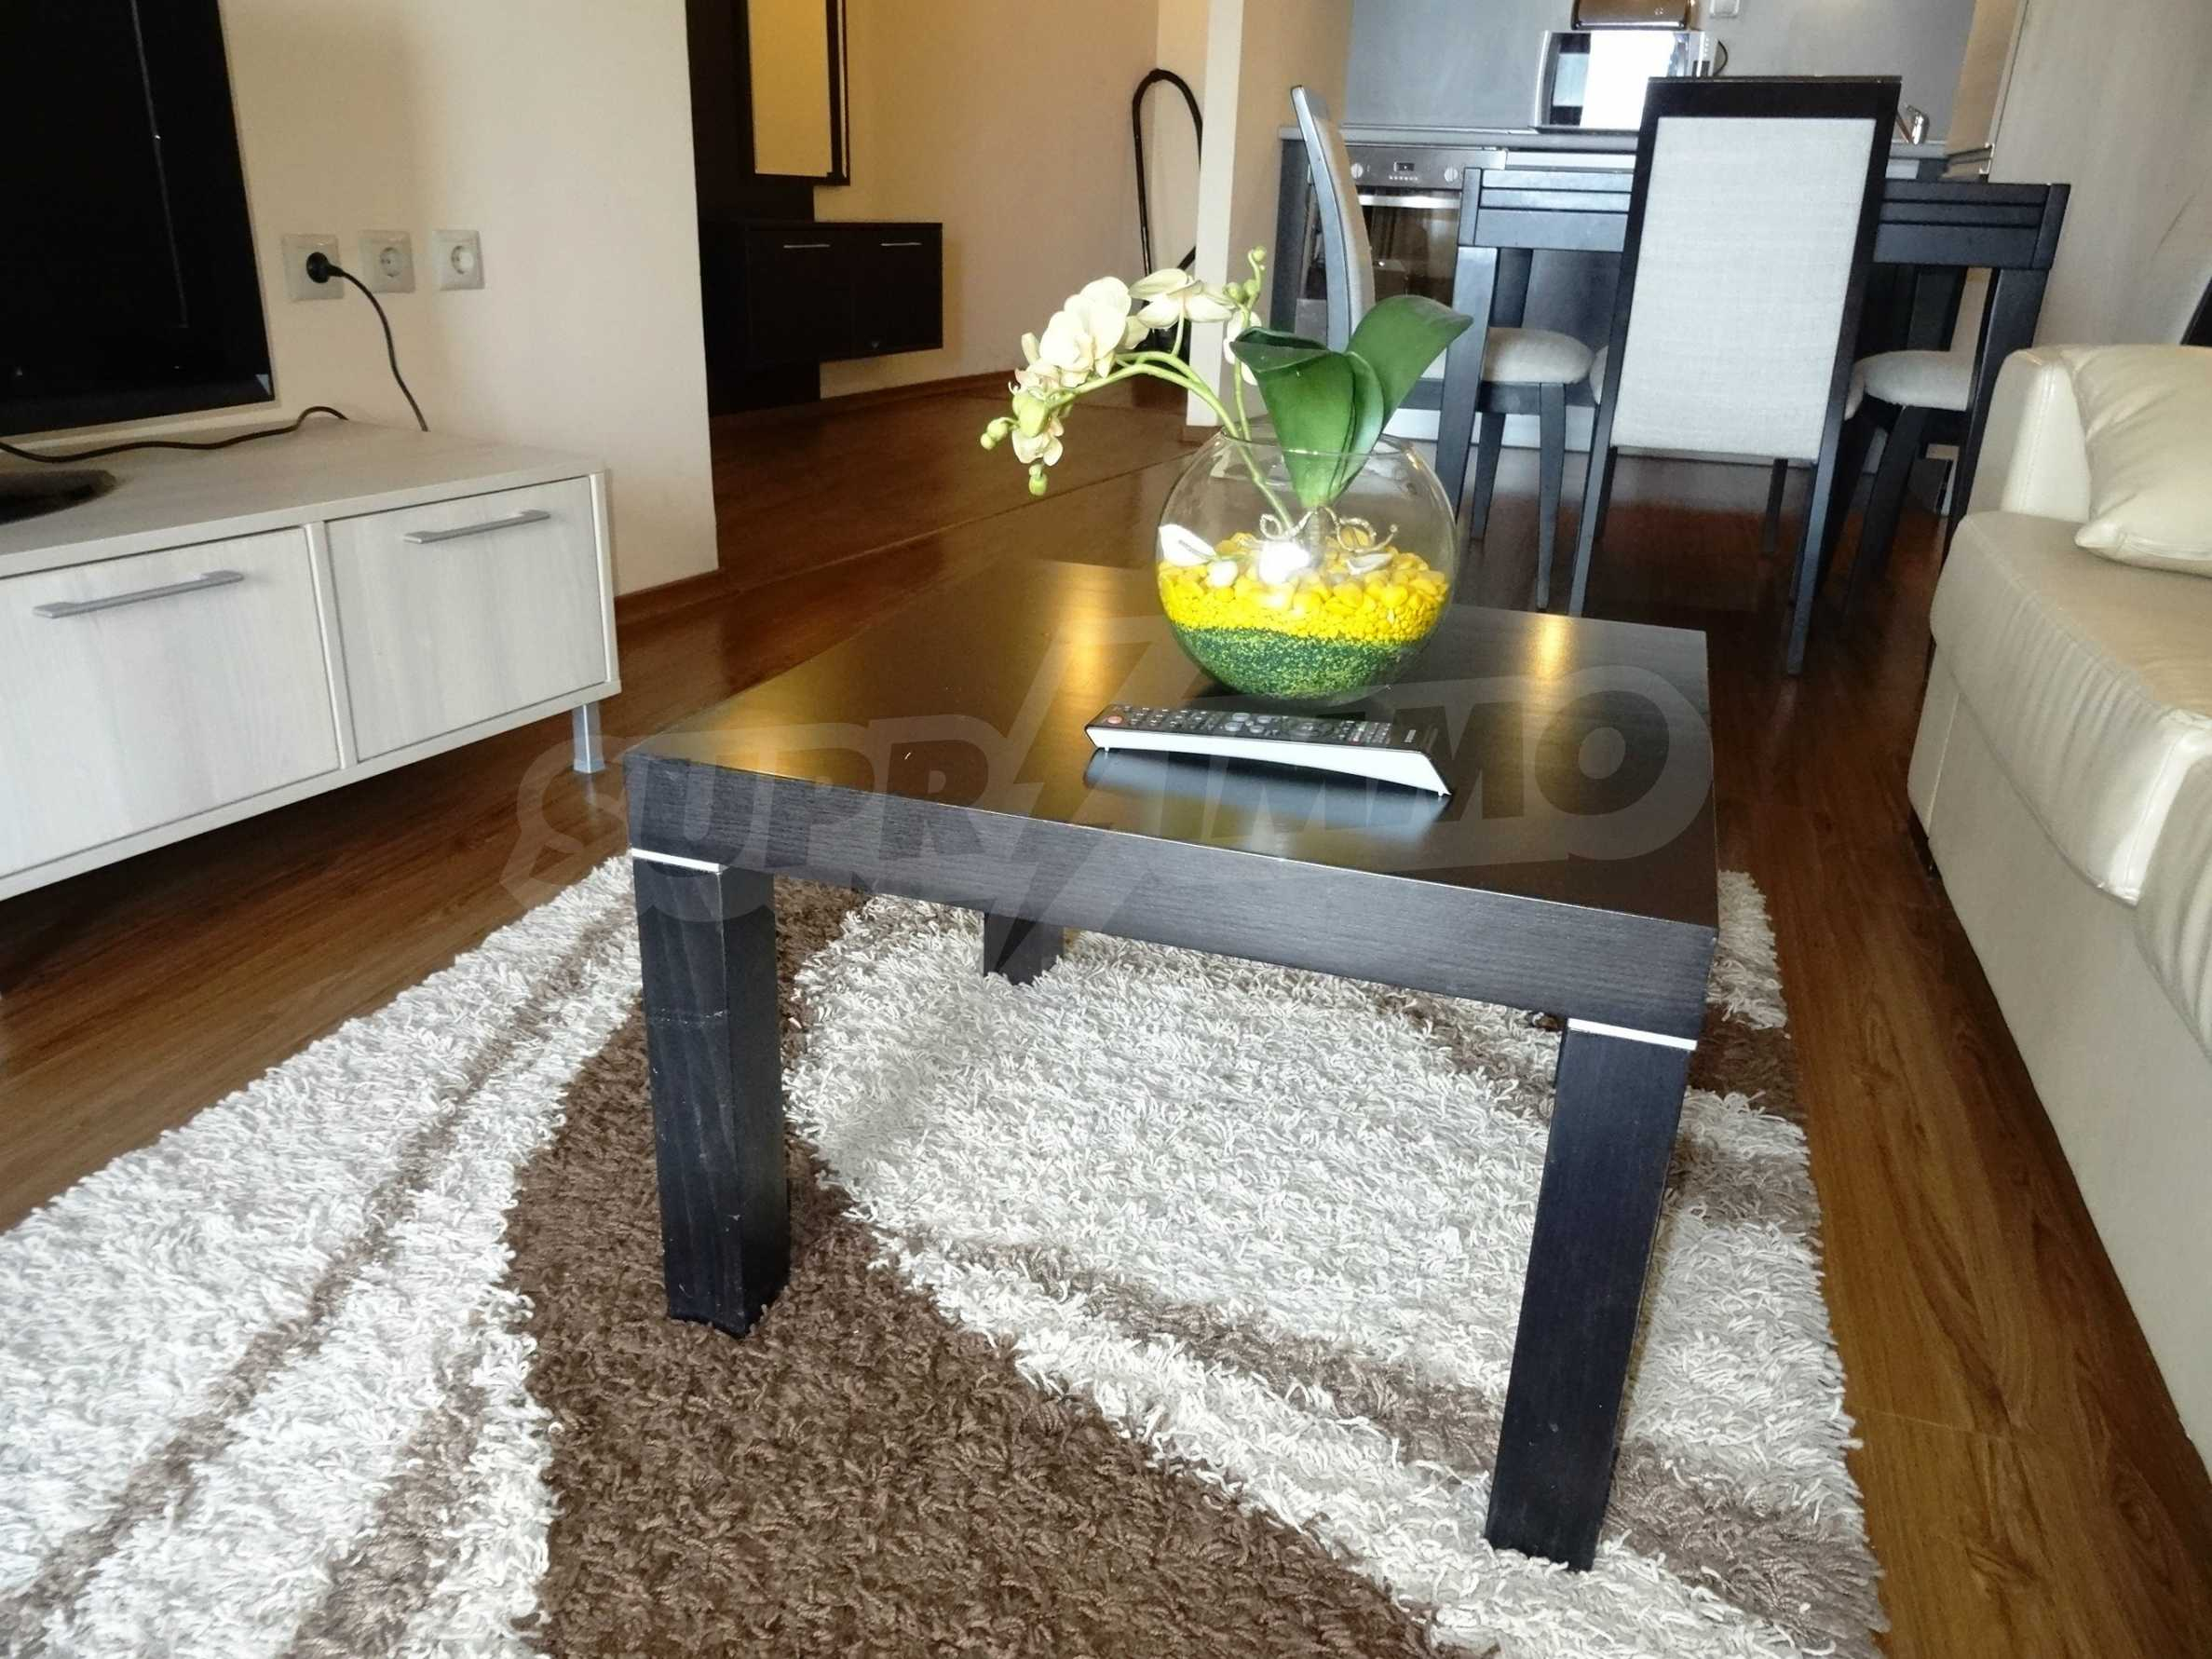 1-bedroom apartment Duralek  1